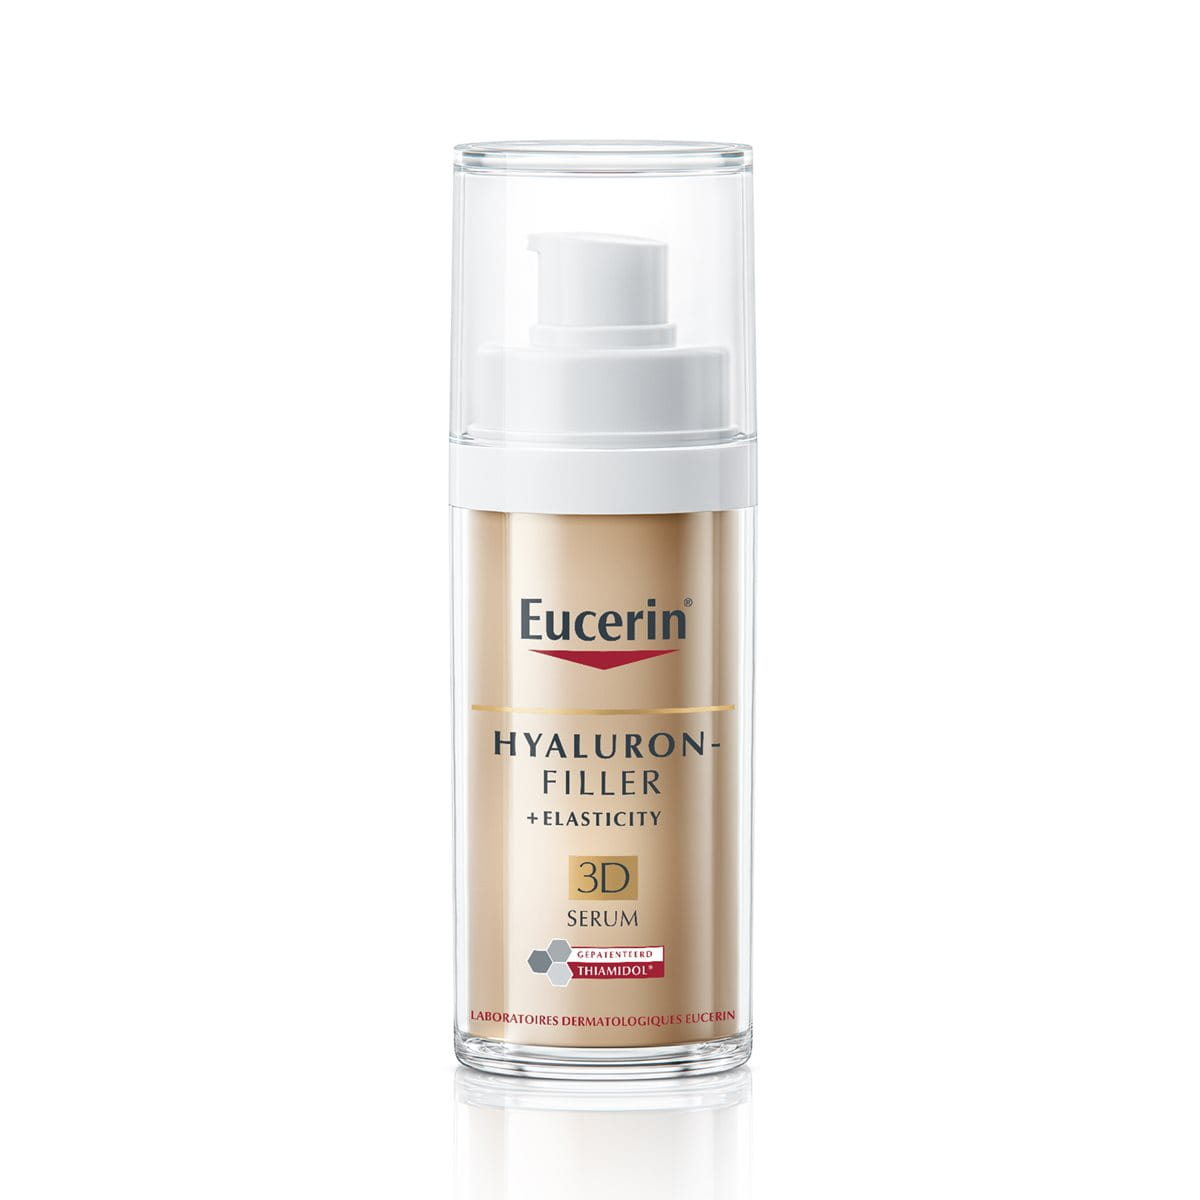 Hyaluron-Filler + Elasticity serum tegen rimpels en oudersdomsvlekken | Eucerin